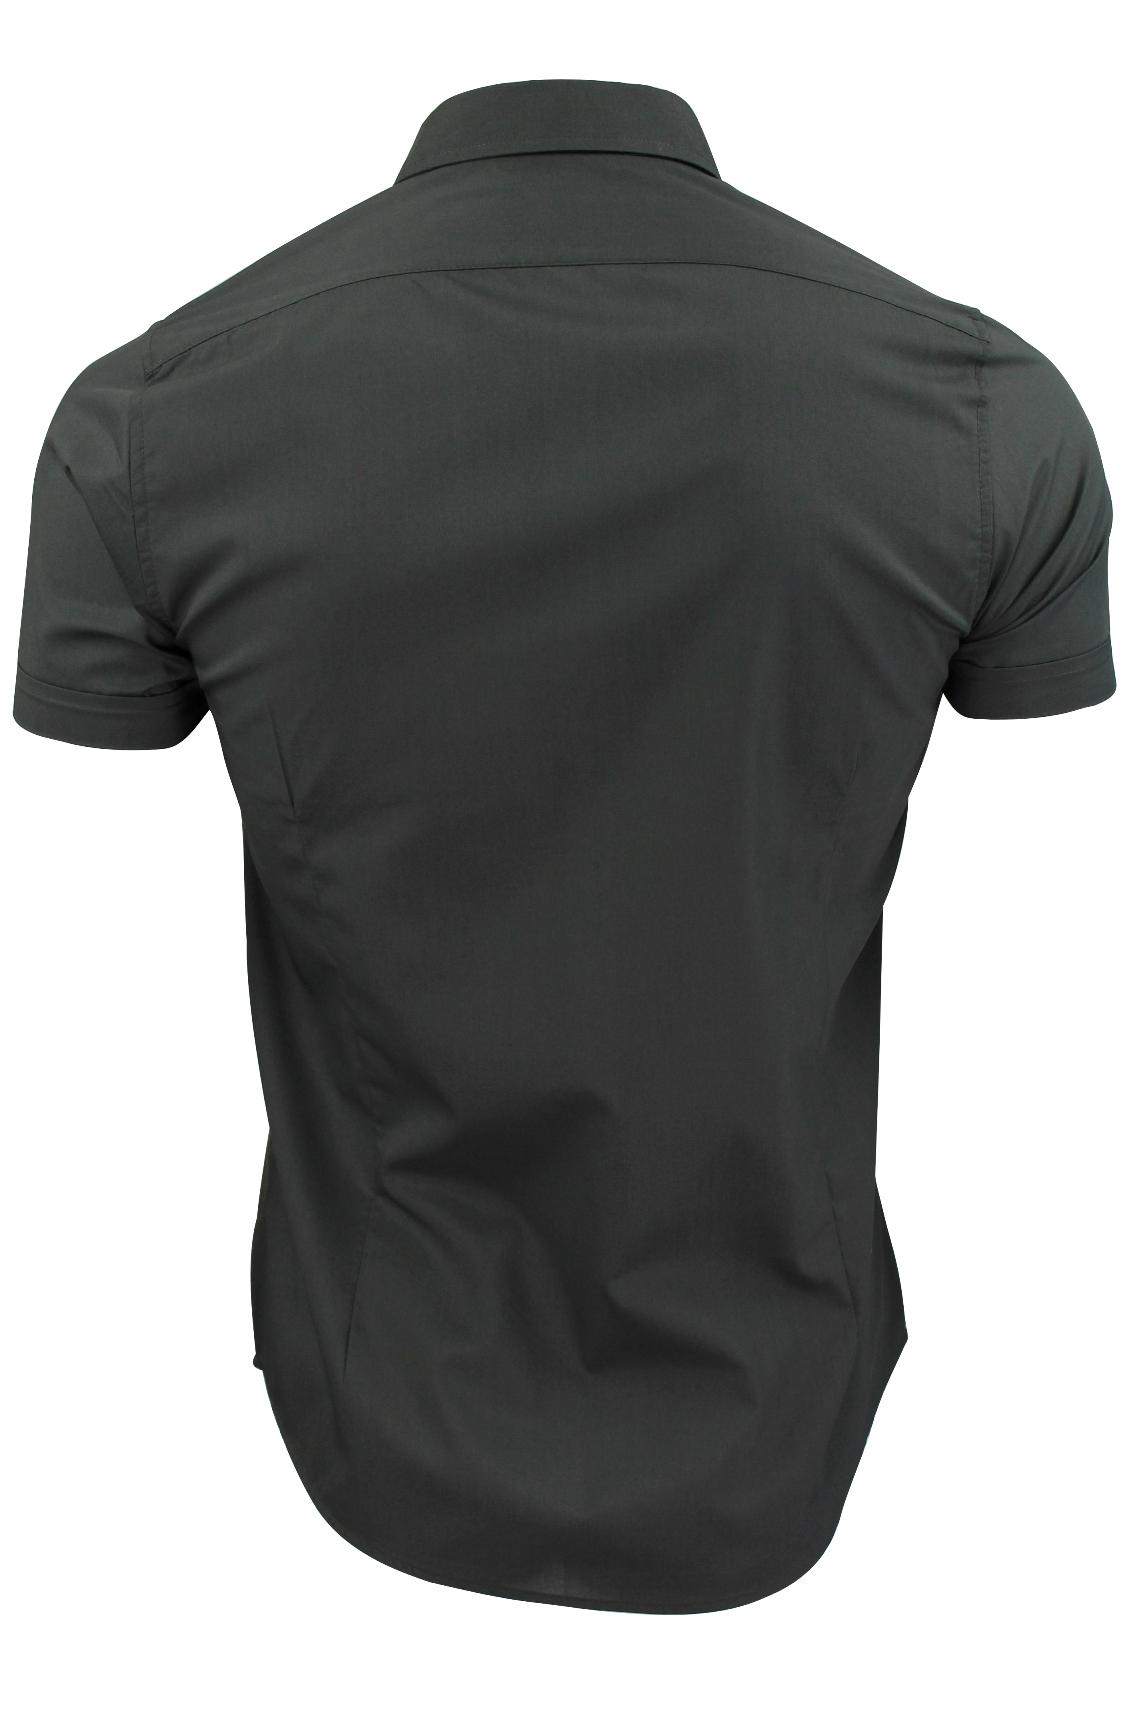 Brave-Soul-Mens-Plain-Shirt-Short-Sleeved-Slim-Fit thumbnail 11